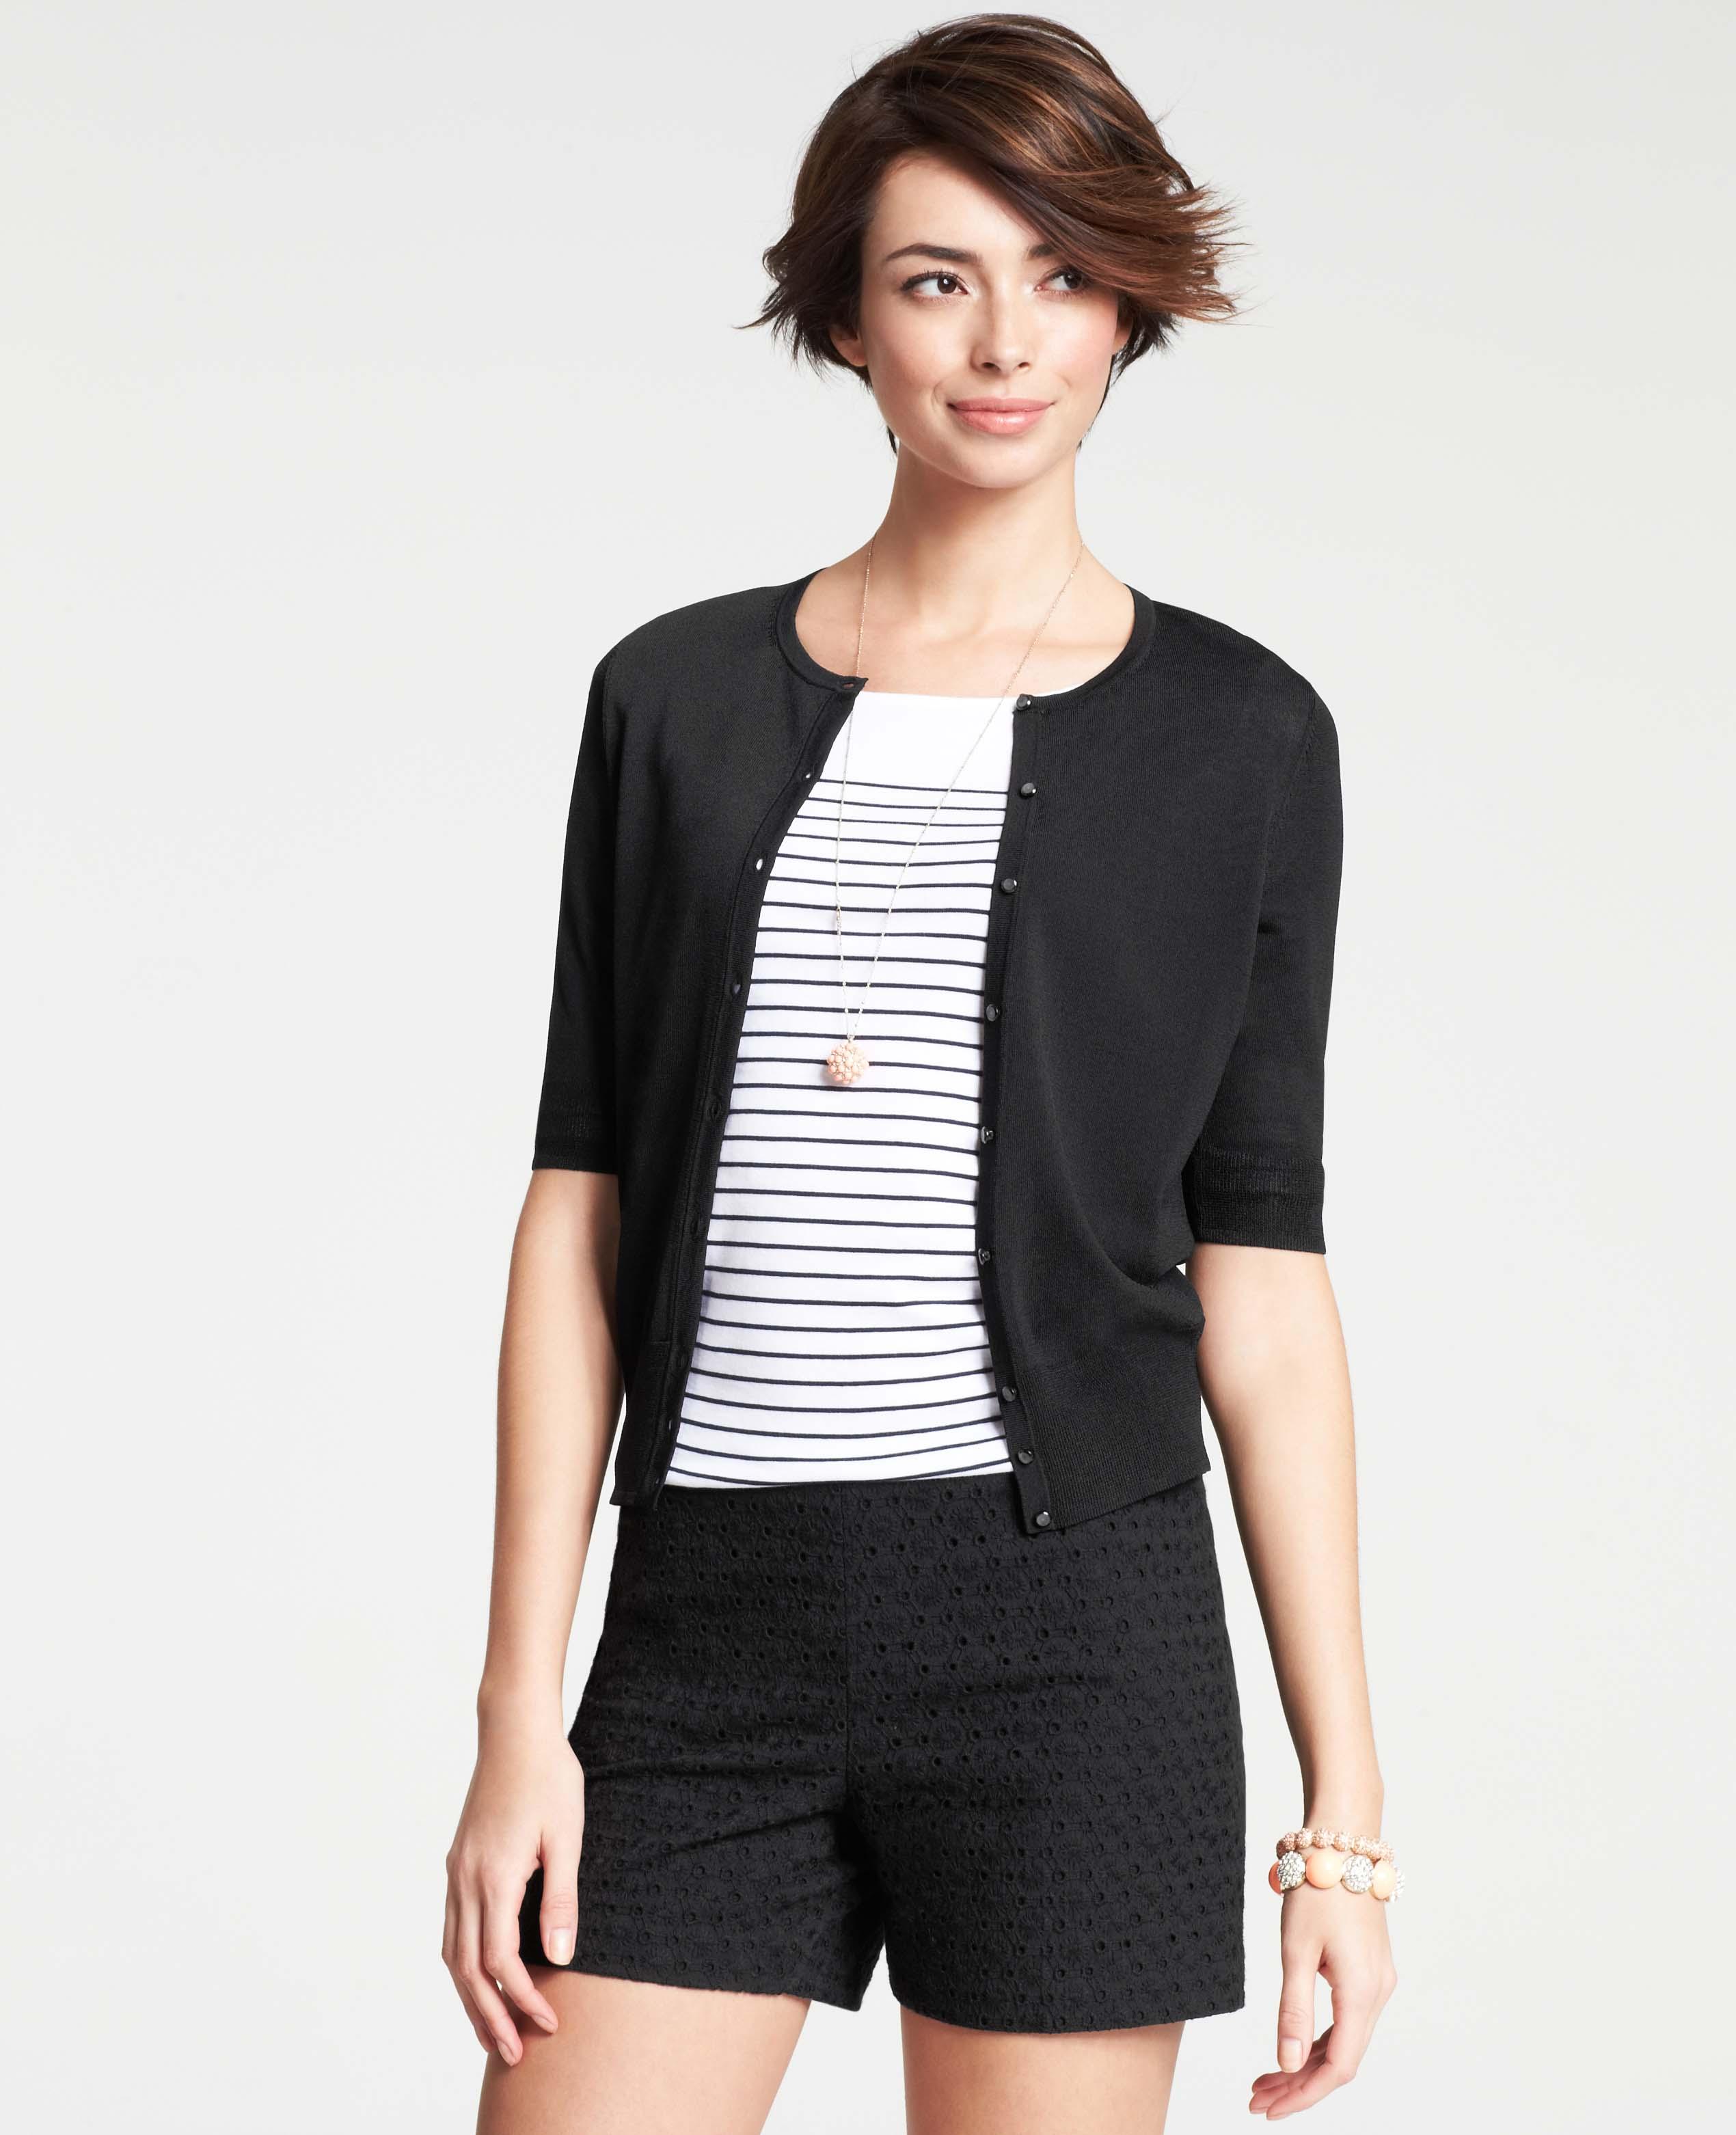 Ann taylor Crew Neck Short Sleeve Cardigan in Black | Lyst